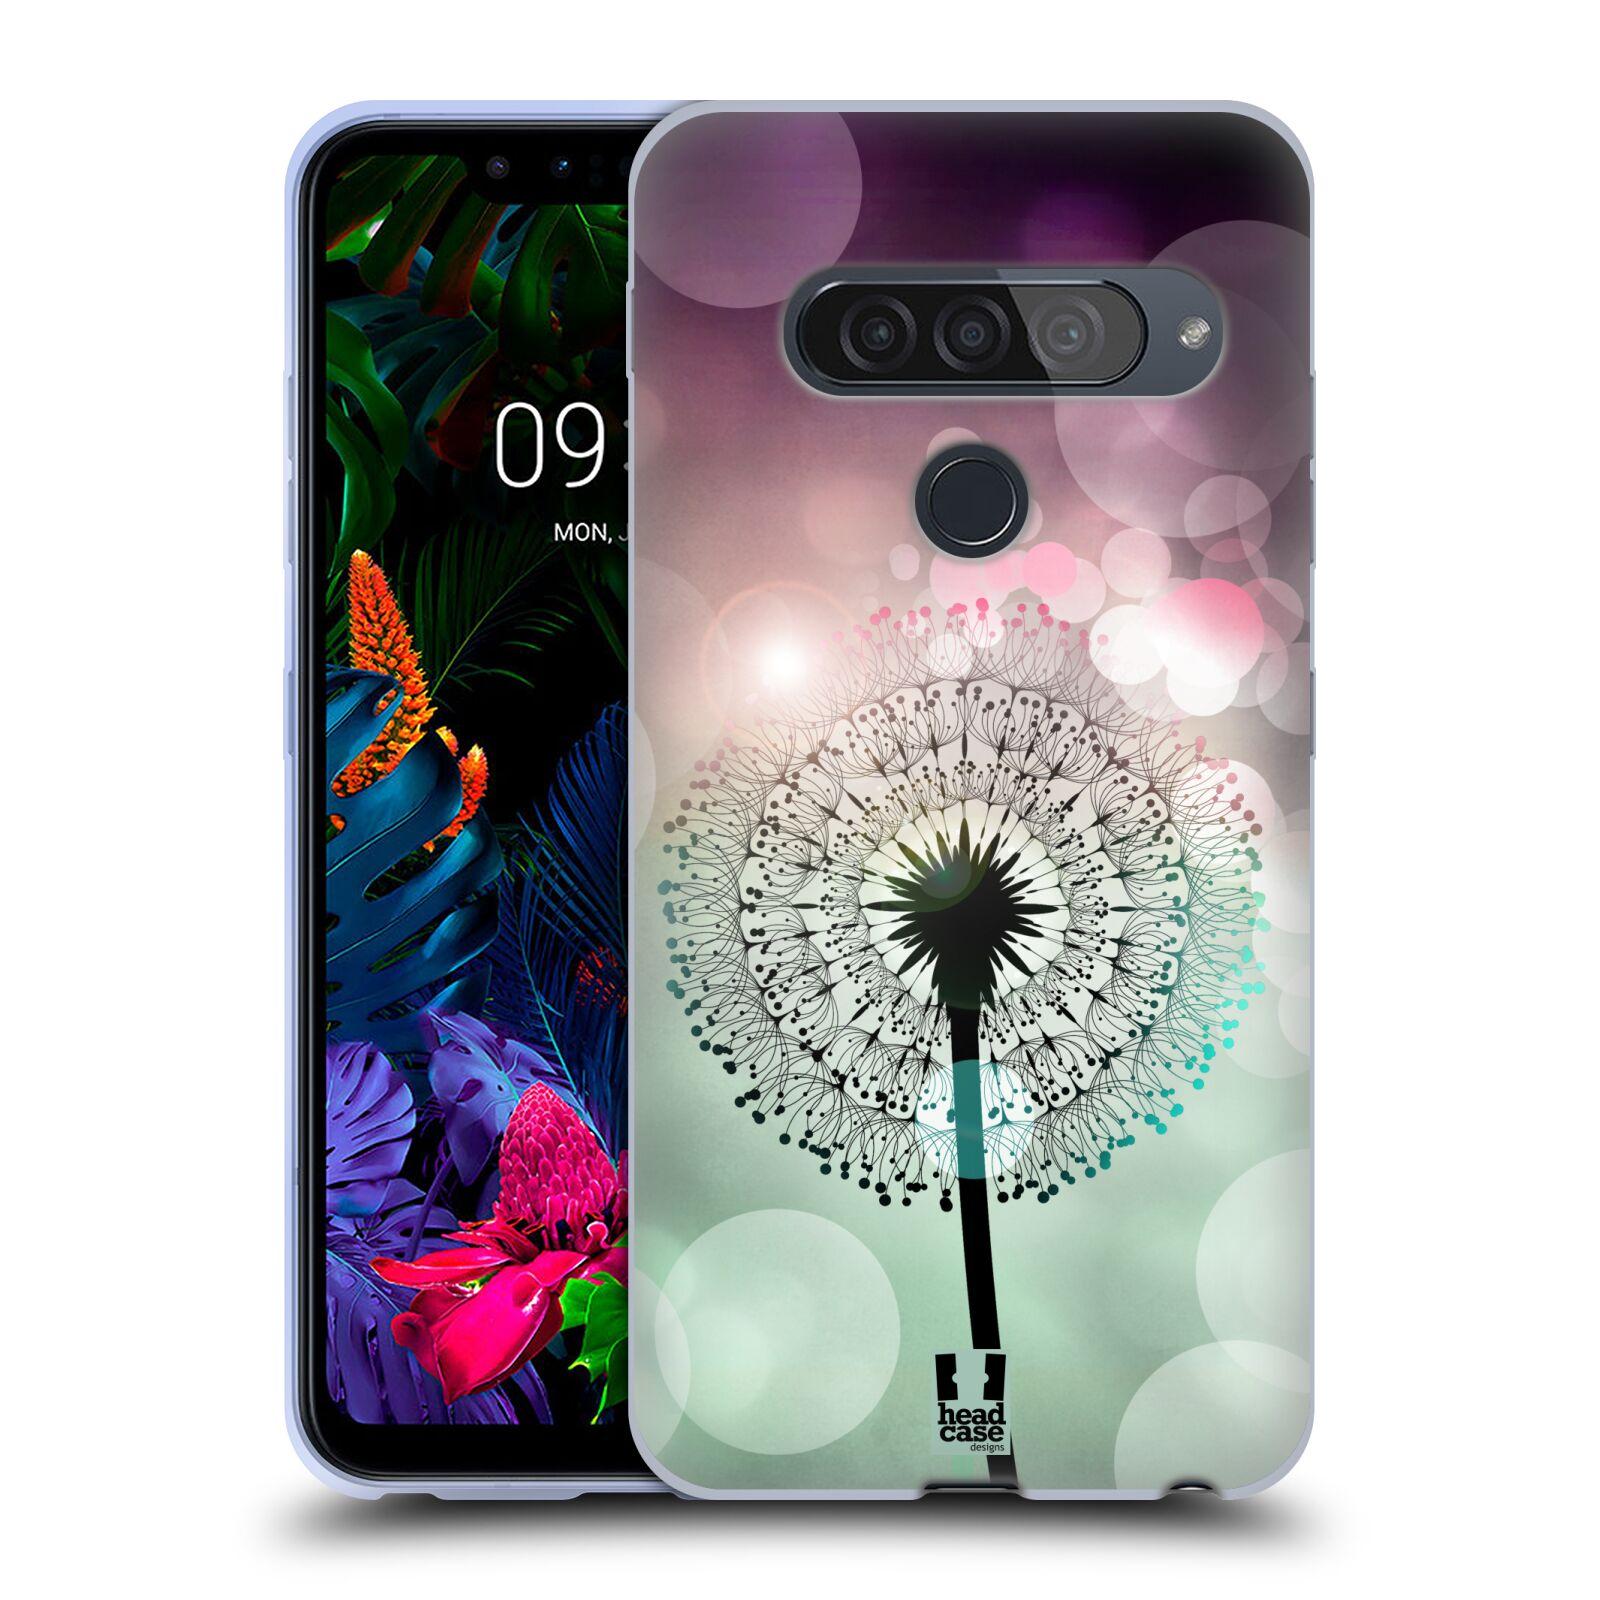 Silikonové pouzdro na mobil LG G8s ThinQ - Head Case - Pampeliškové odlesky